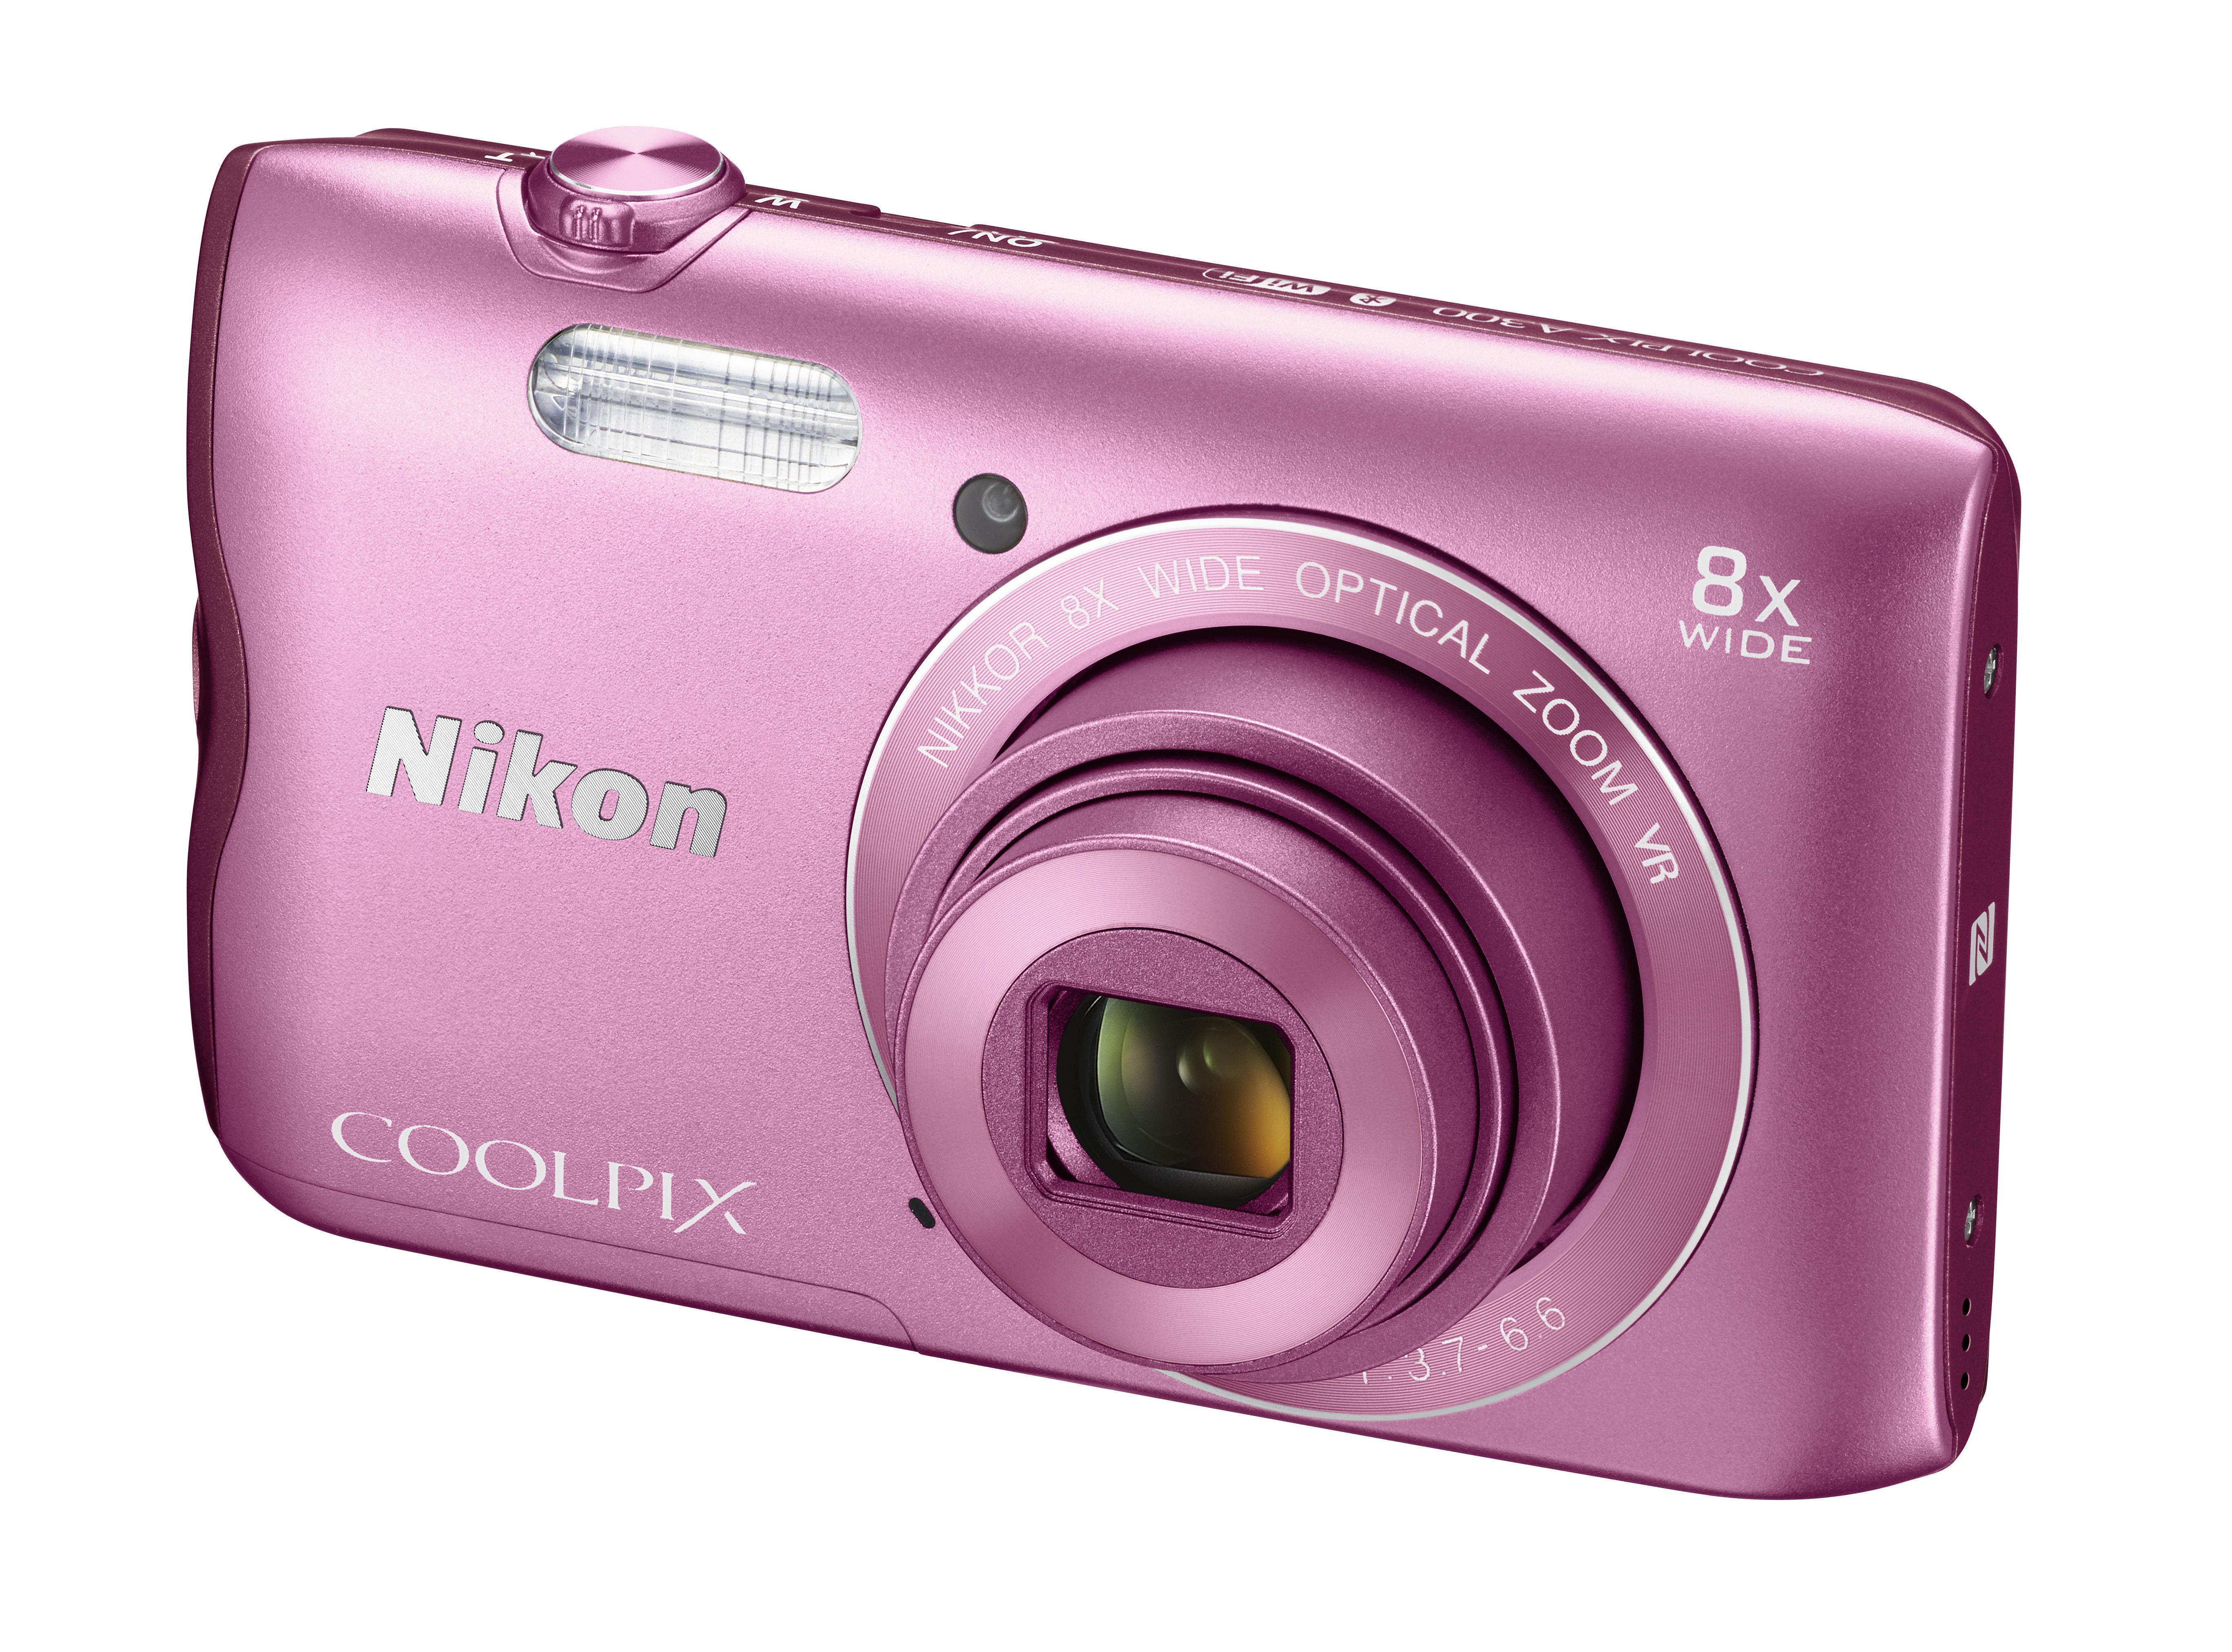 appareil photo compact - coolpix a300 rose